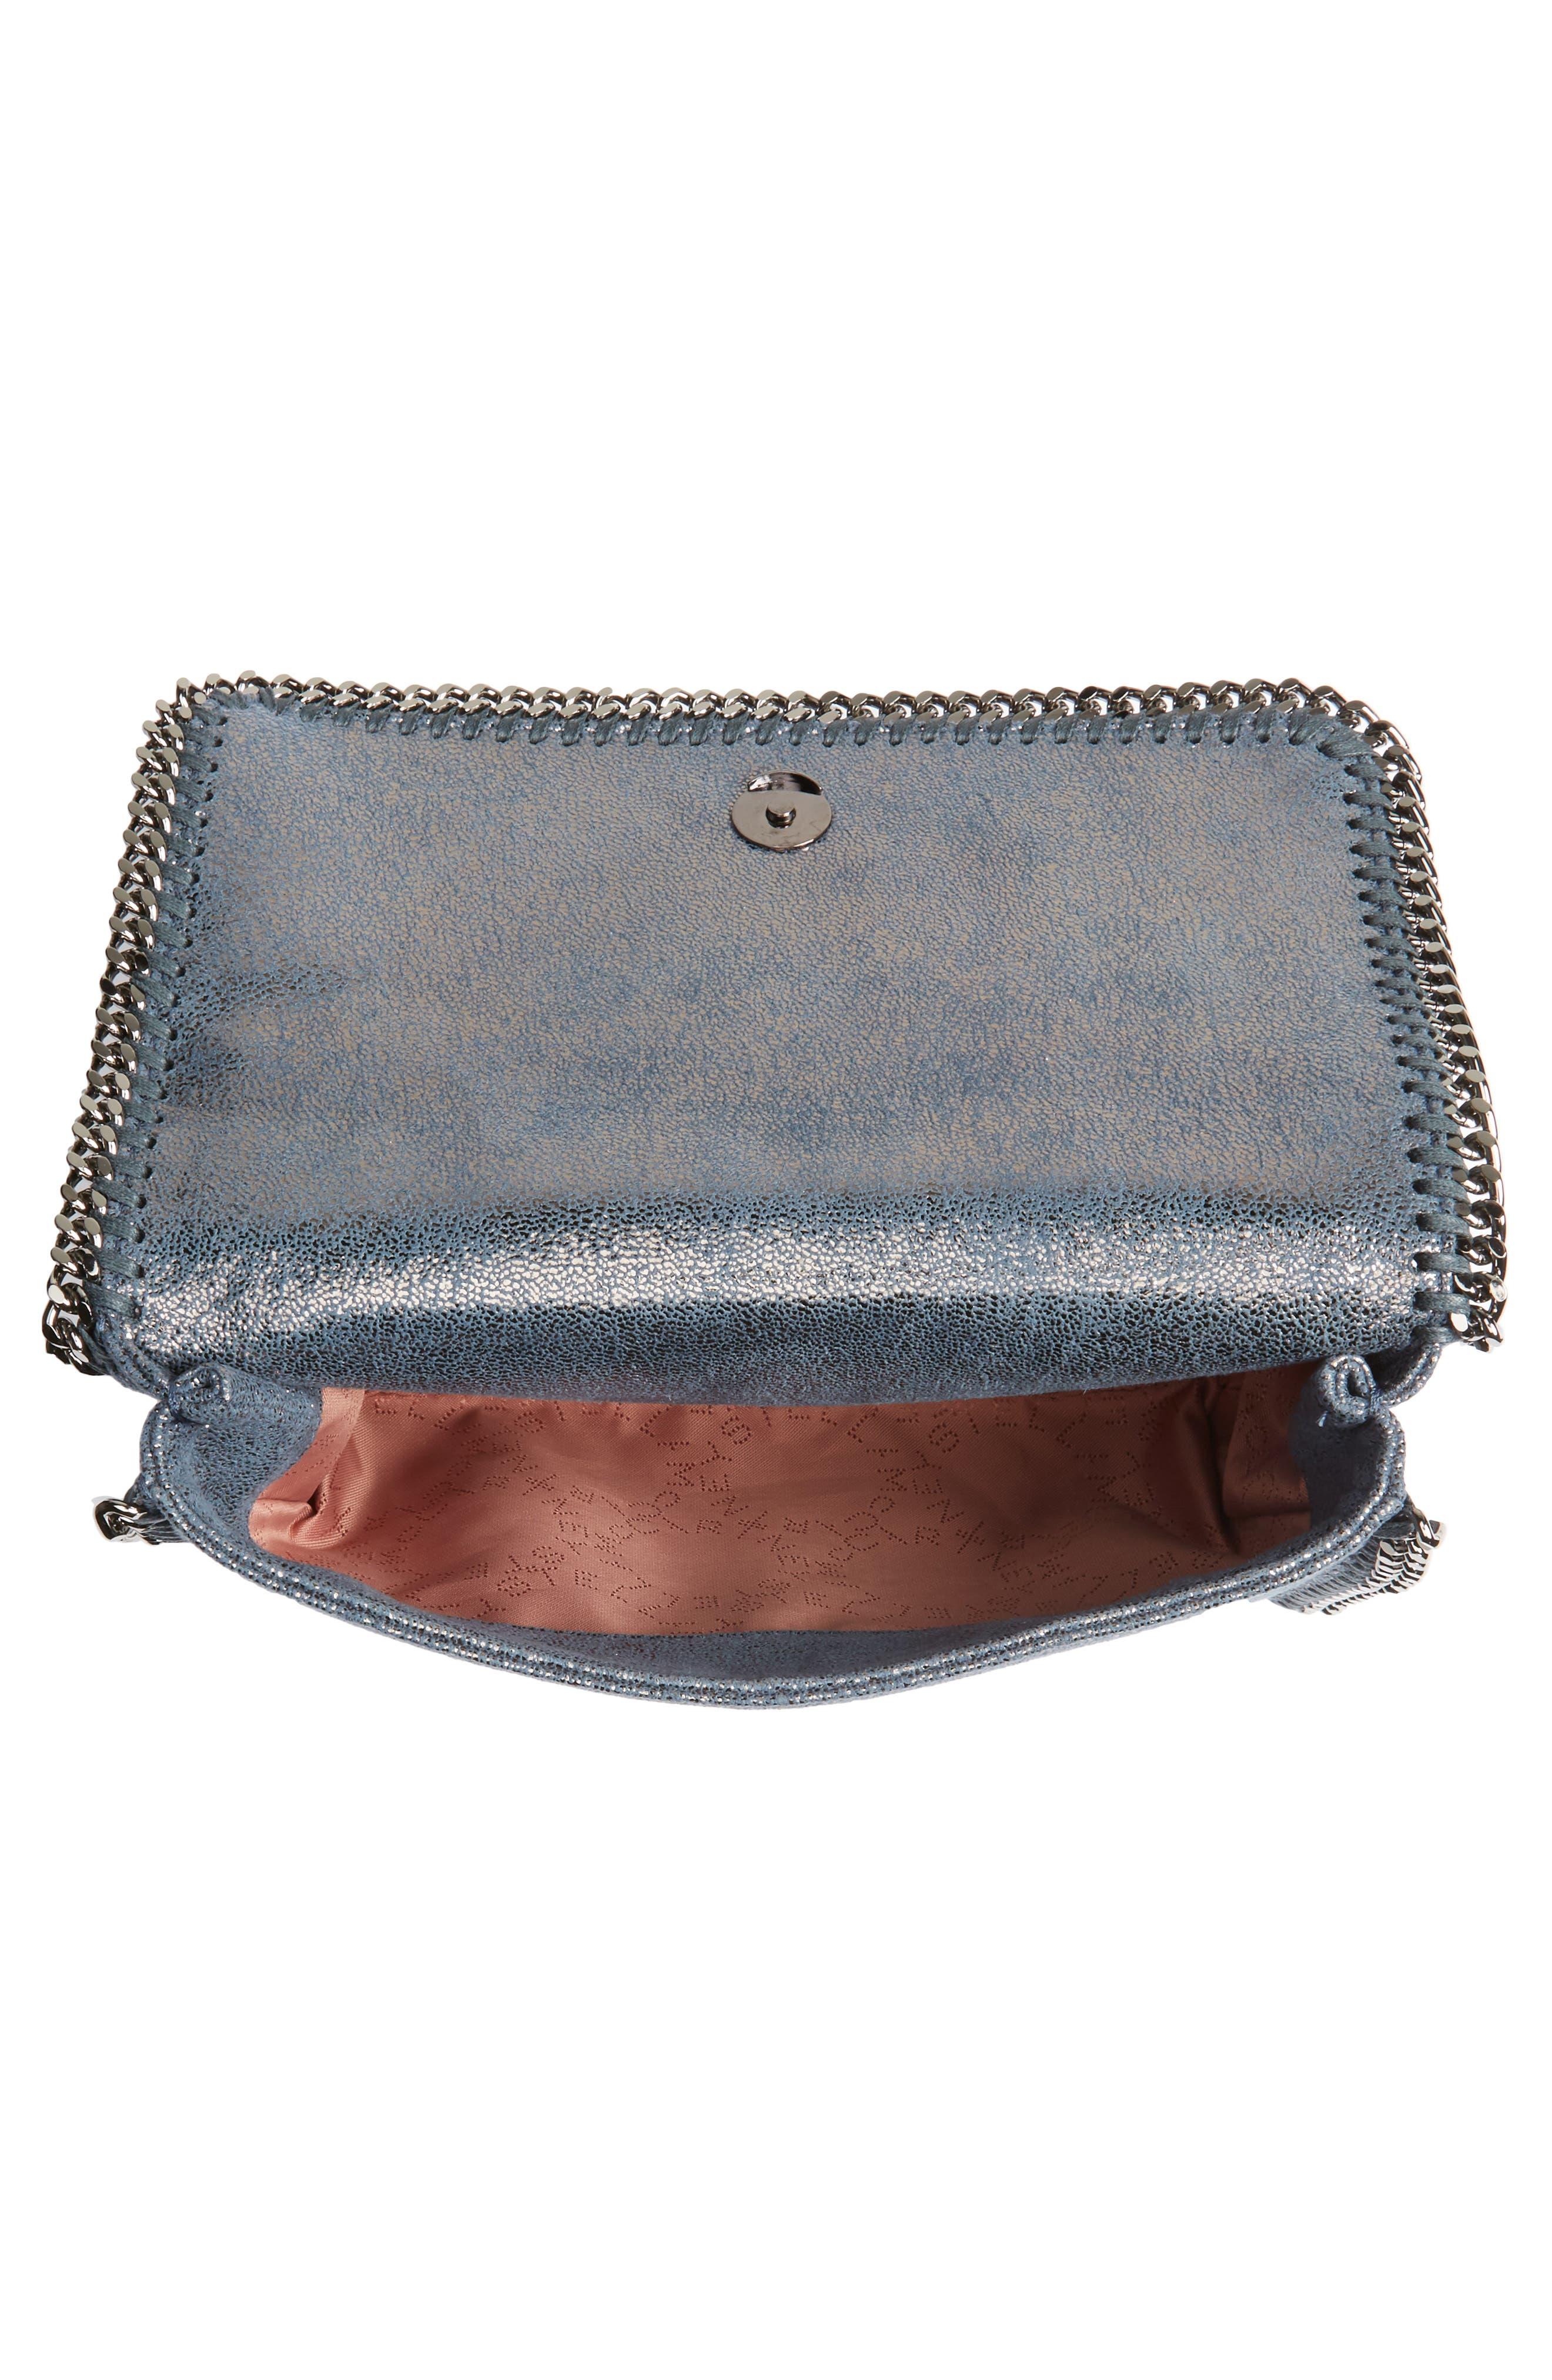 Falabella Metallic Faux Leather Convertible Shoulder Bag,                             Alternate thumbnail 4, color,                             Blue Lagoon